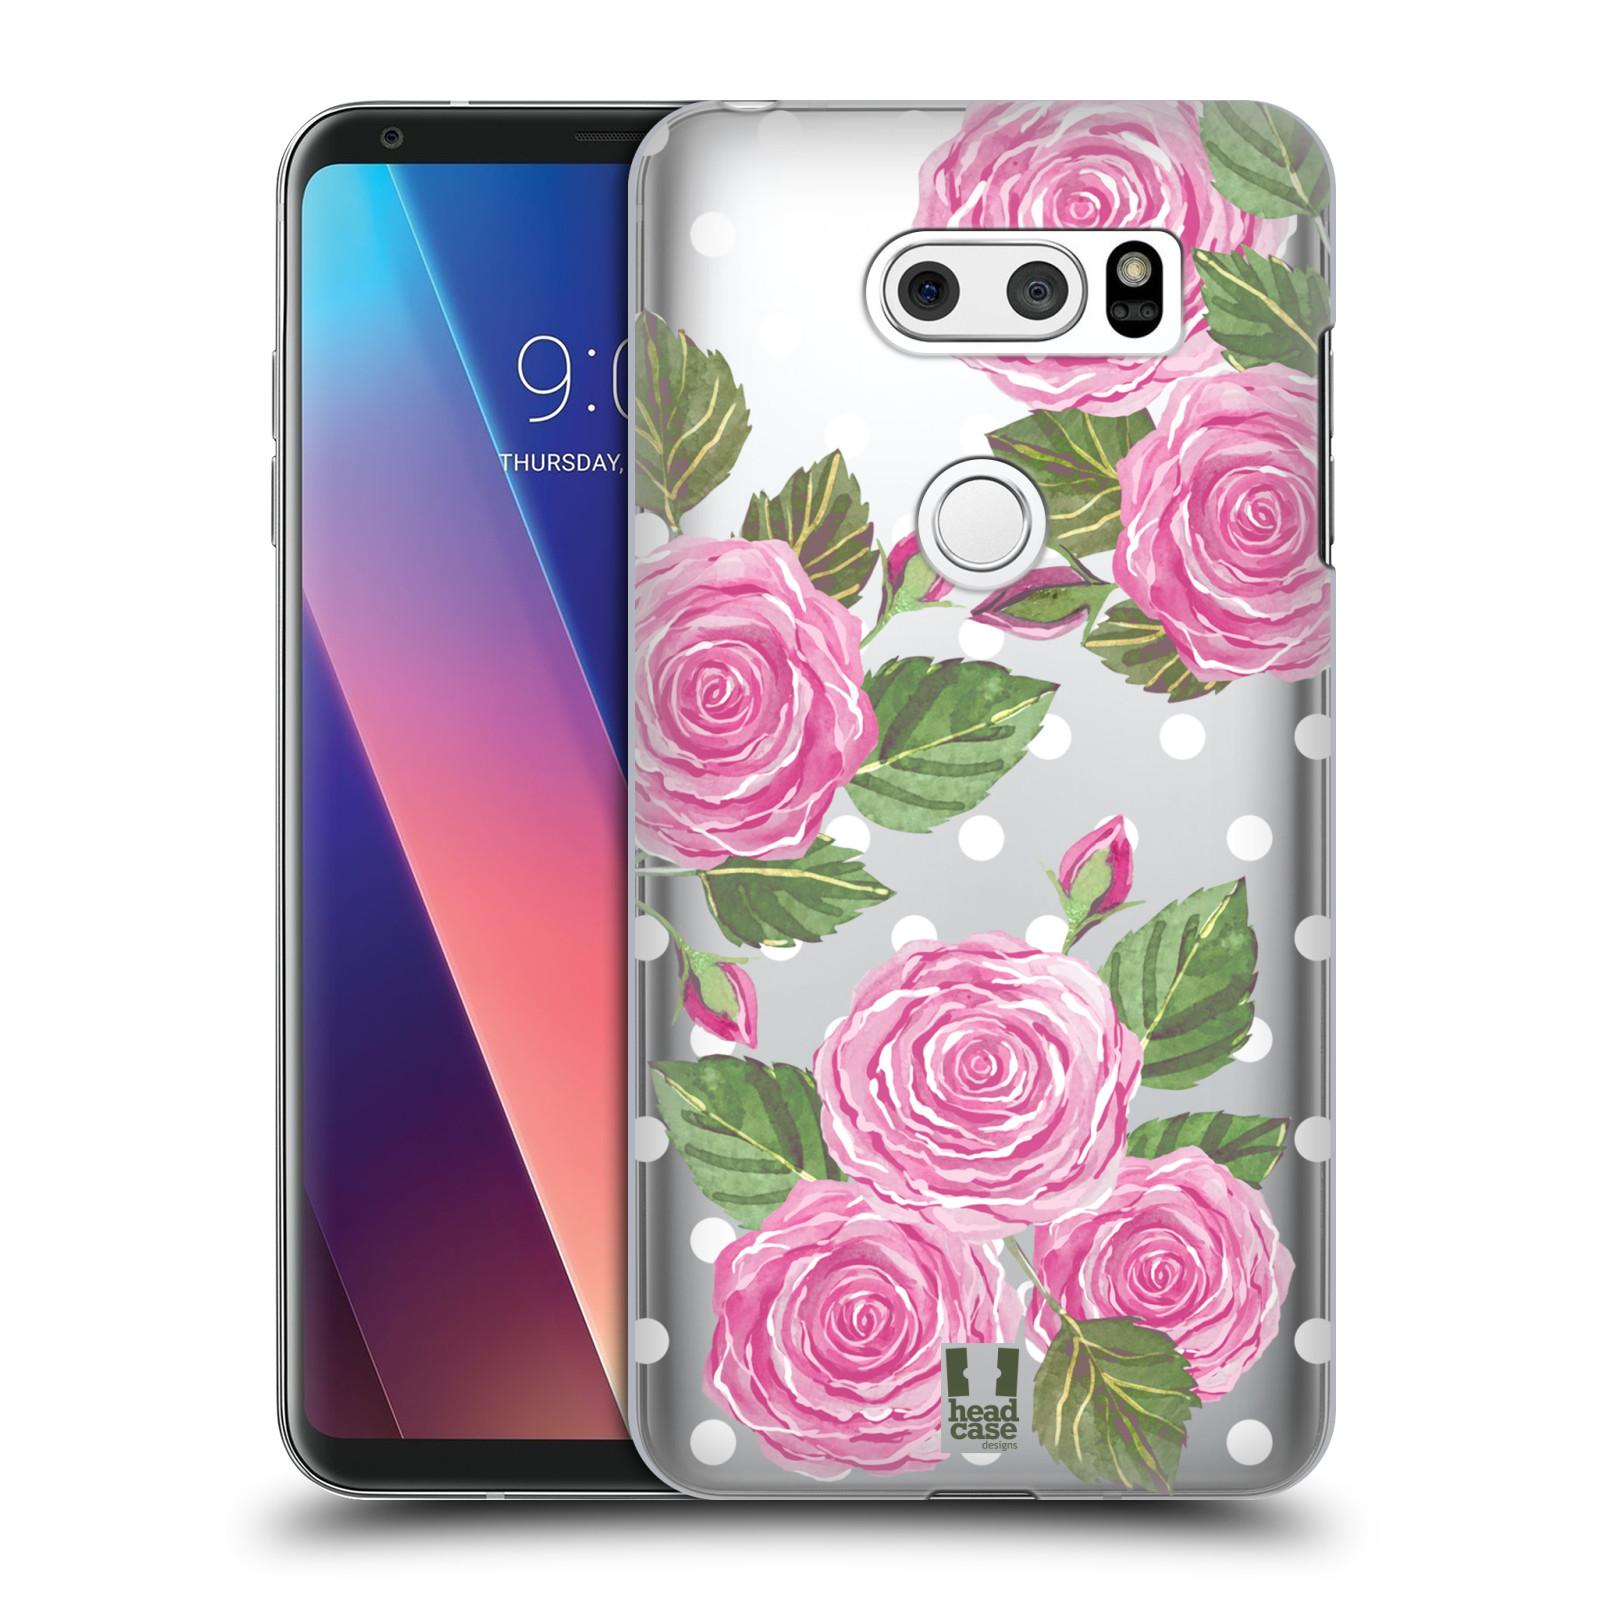 Plastové pouzdro na mobil LG V30 - Head Case - Hezoučké růžičky - průhledné